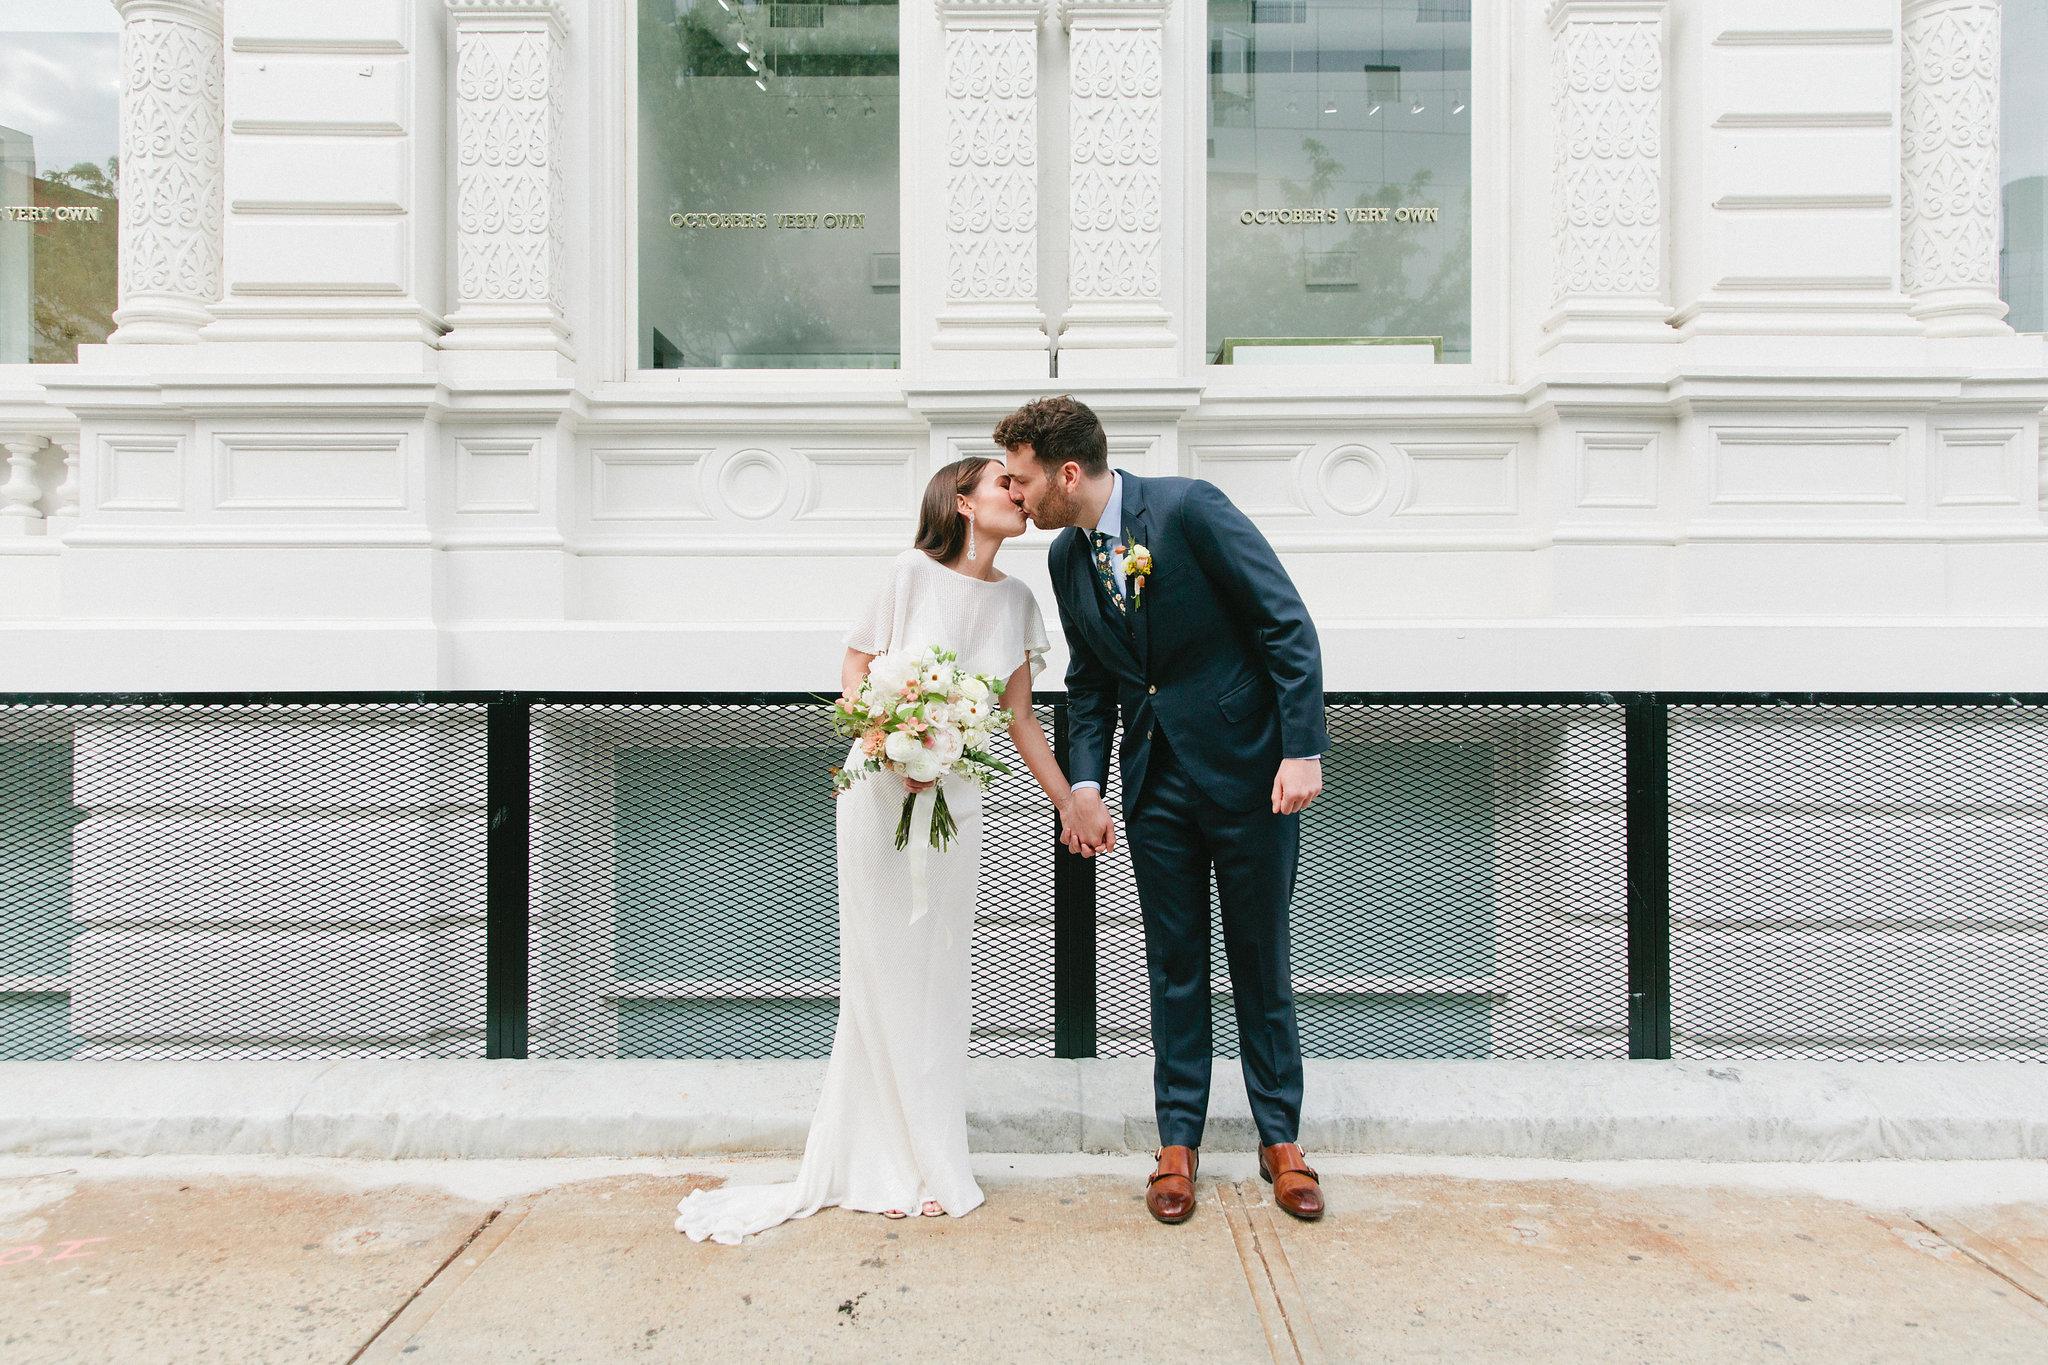 bowery-hotel-wedding-jove-meyer-events-024.jpg